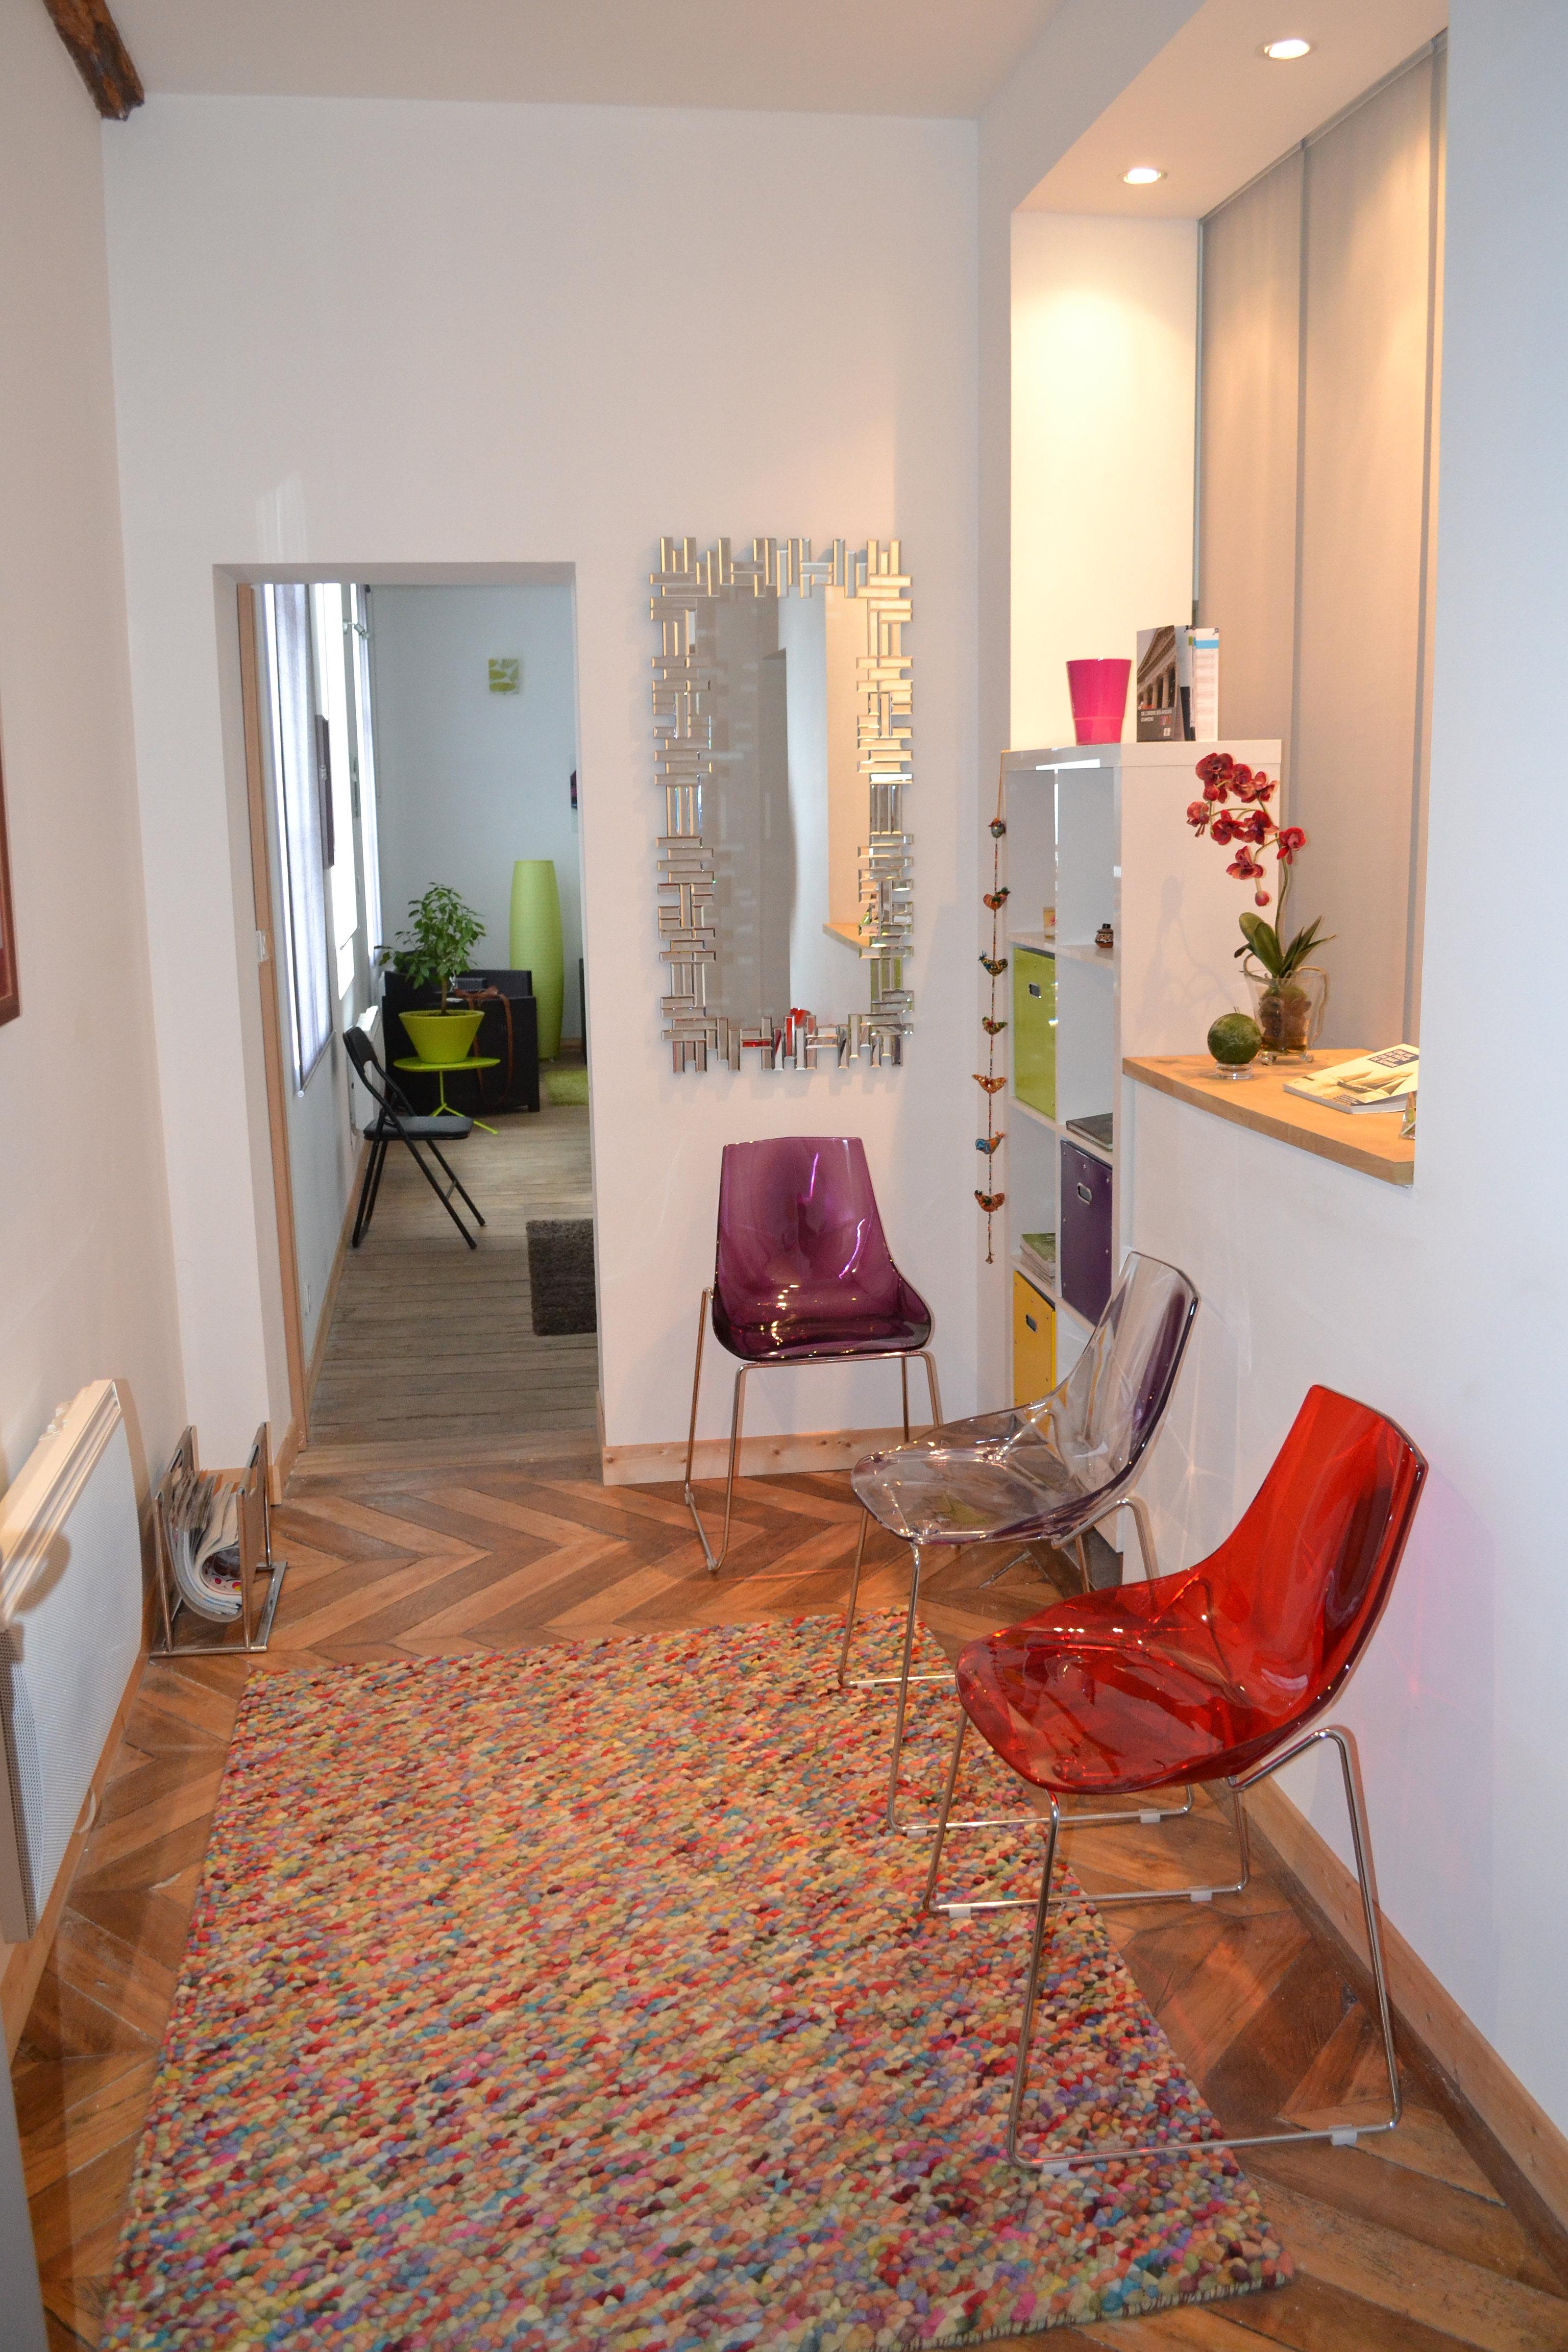 avocat divorce amiens cabinet st phanie lourdel iglesias. Black Bedroom Furniture Sets. Home Design Ideas